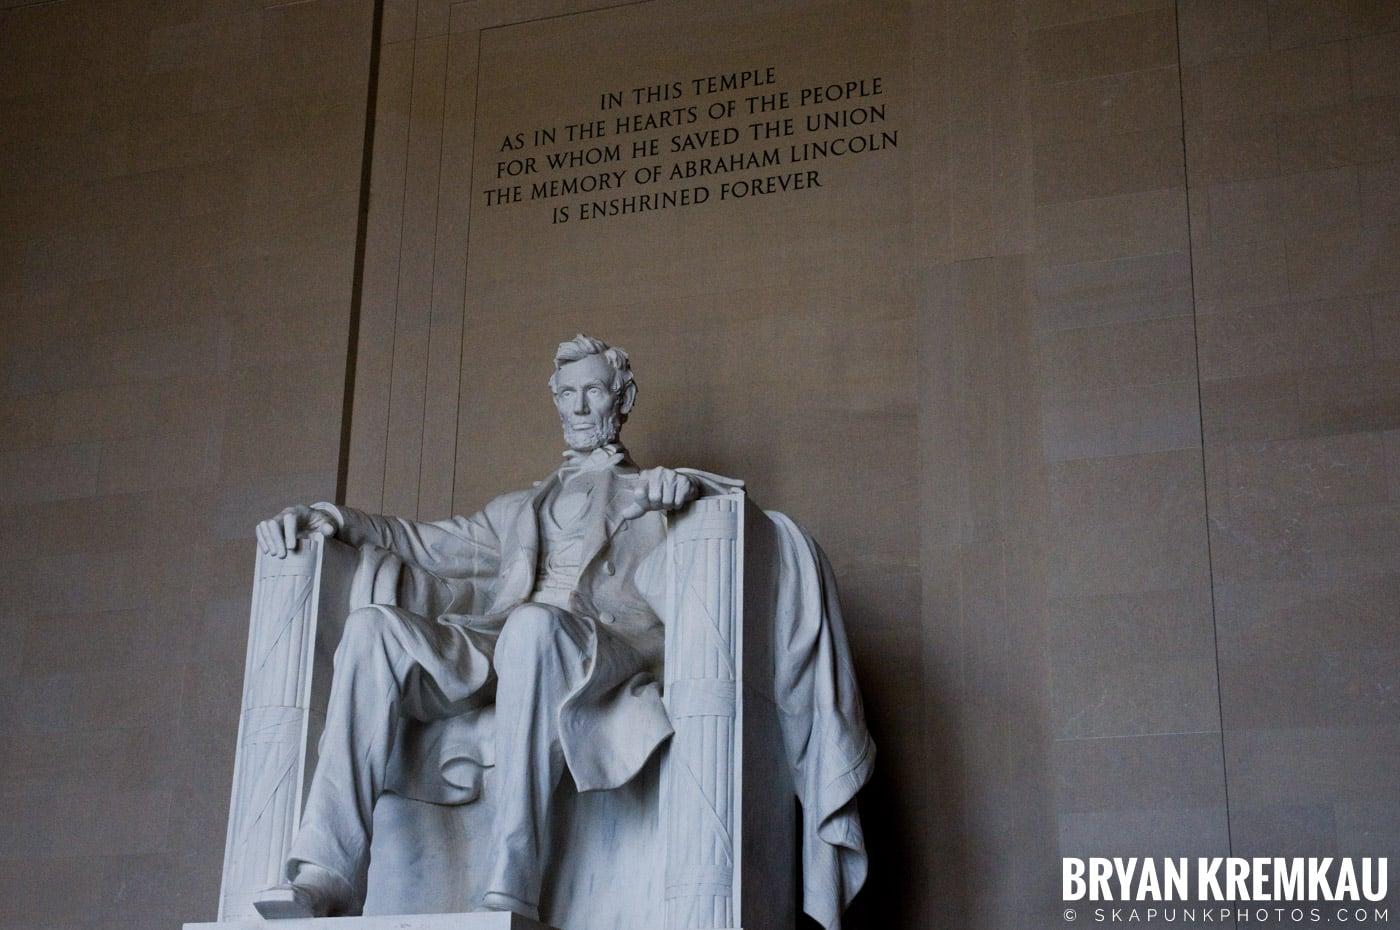 Washington, DC Trip - Day 2 - 4.9.10 (10)